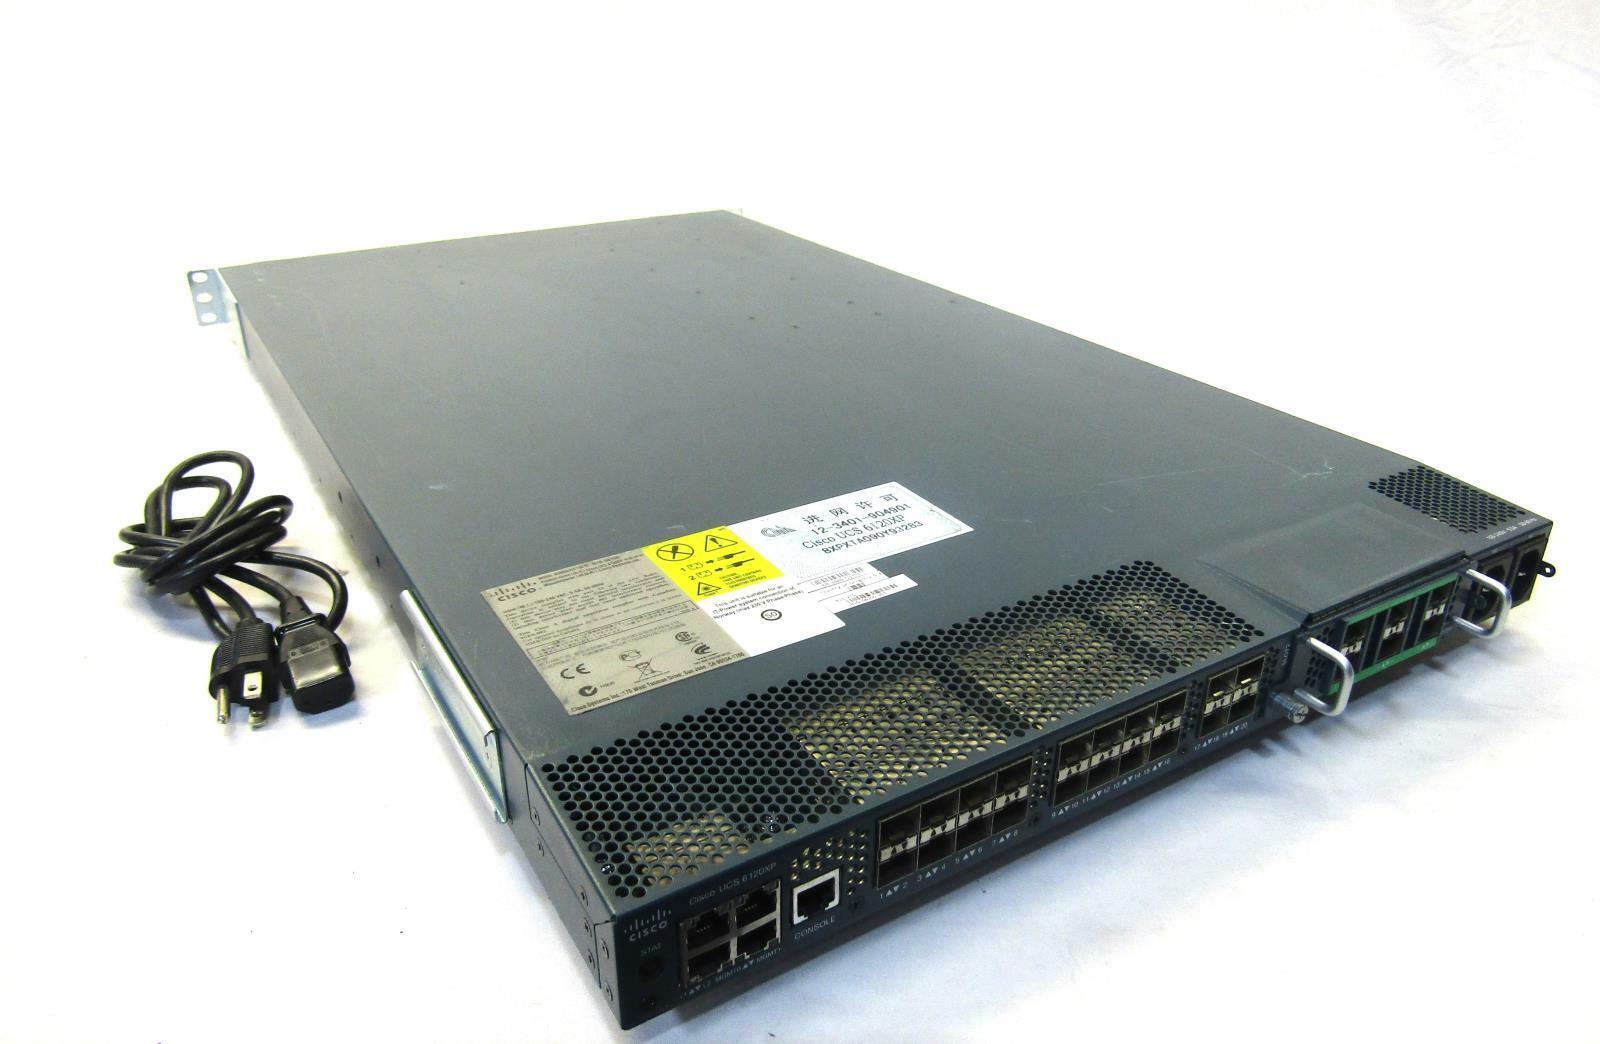 FABRIC INTERCONNECT N10-S6200 W// N10-E0060 CISCO UCS 6140XP 40-PORT 10GBE SFP